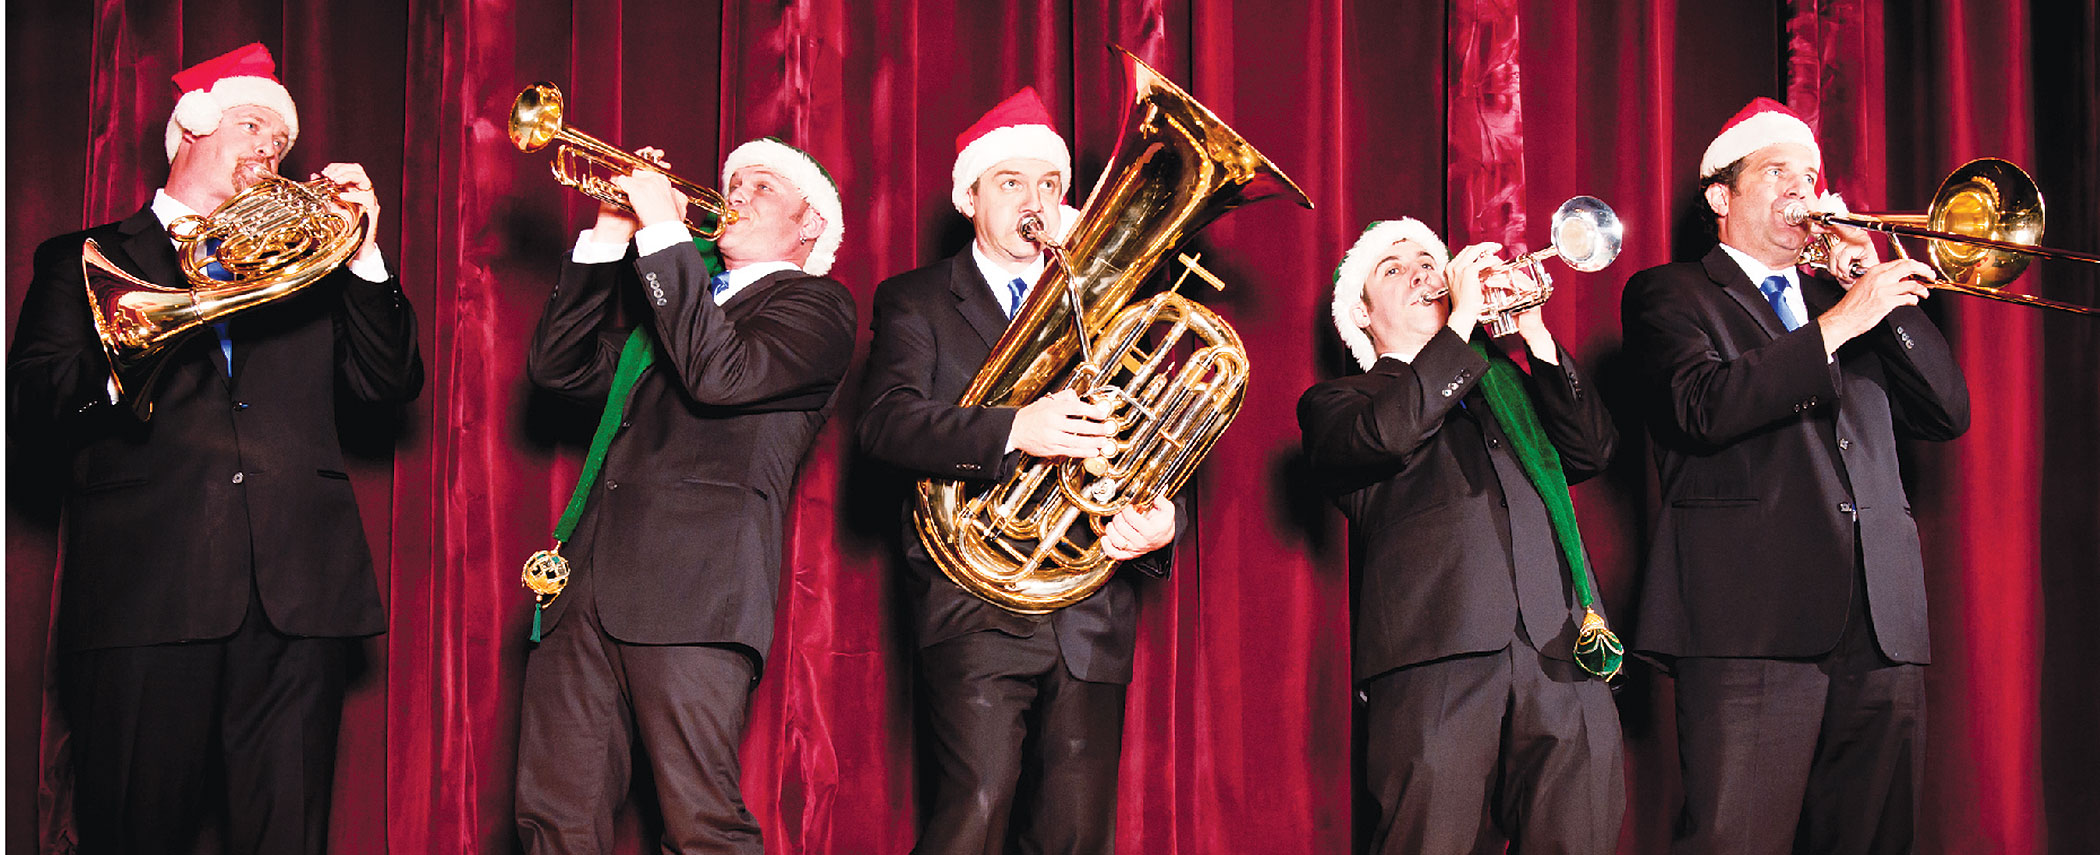 Dec 2 Presidio Brass Quintet Presents Holiday Favorites